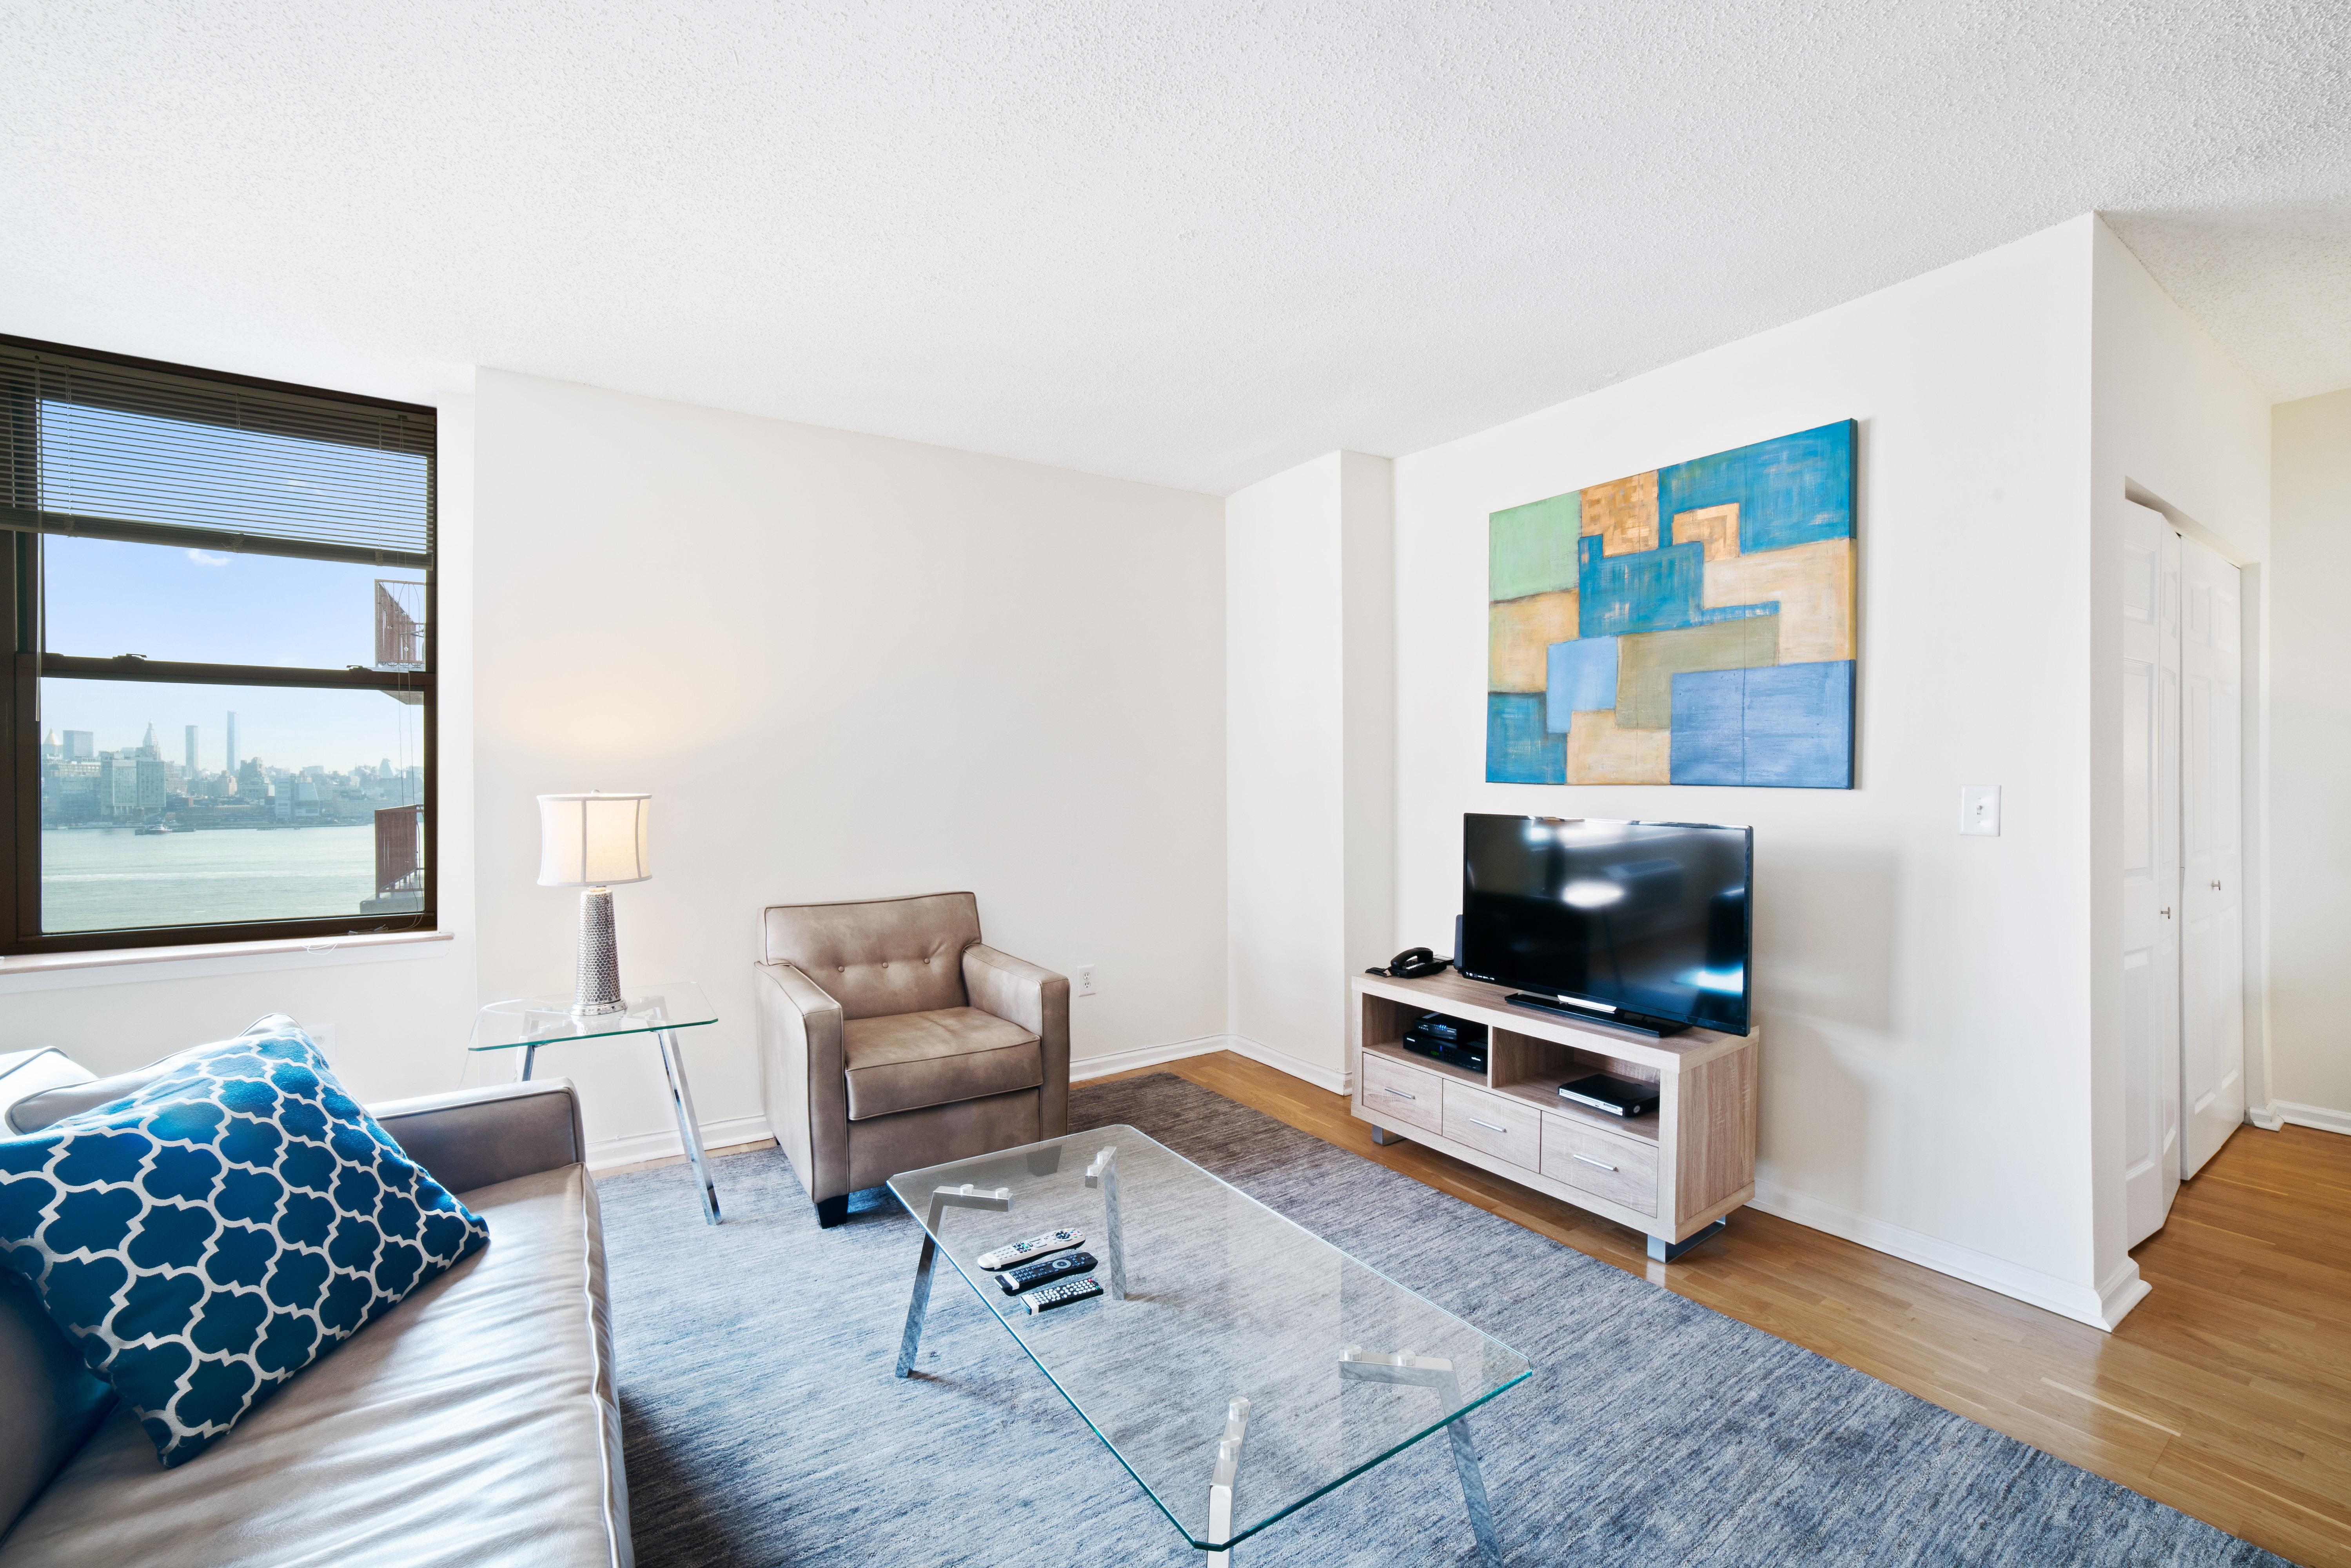 image 9 furnished 1 bedroom Apartment for rent in Hoboken, Hudson County